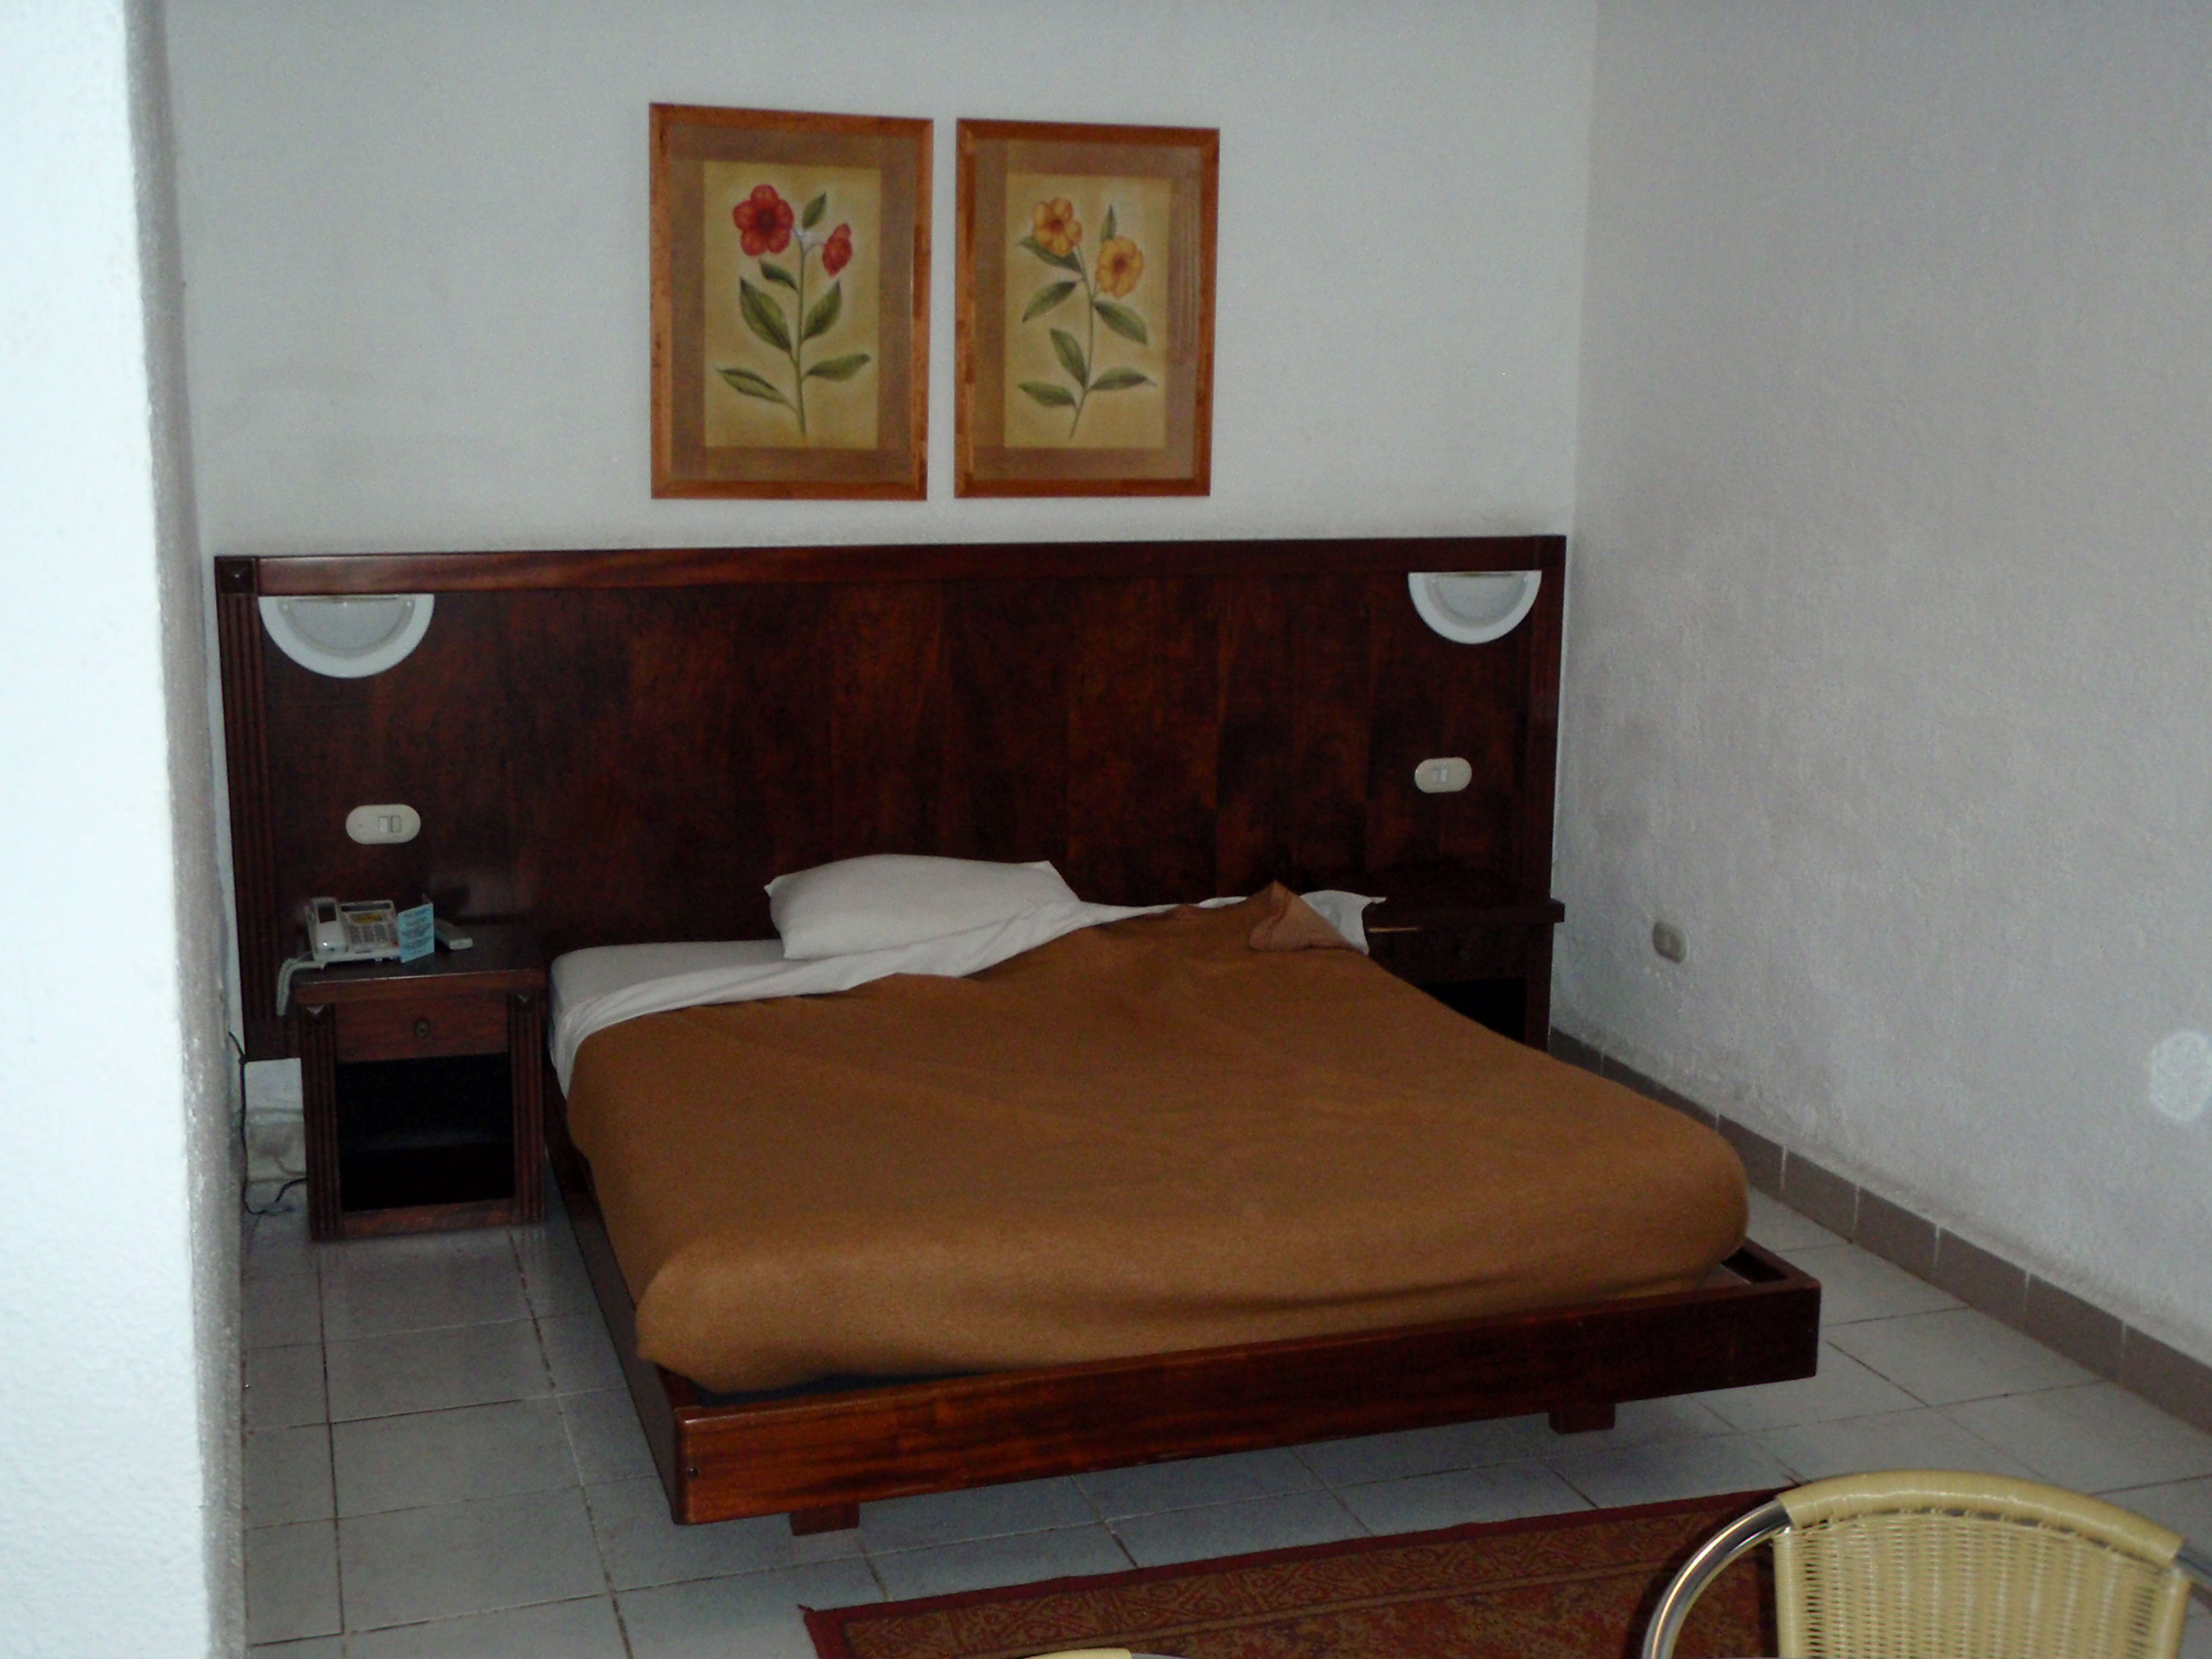 Hotel Room; Conakry, Guinea; 2010